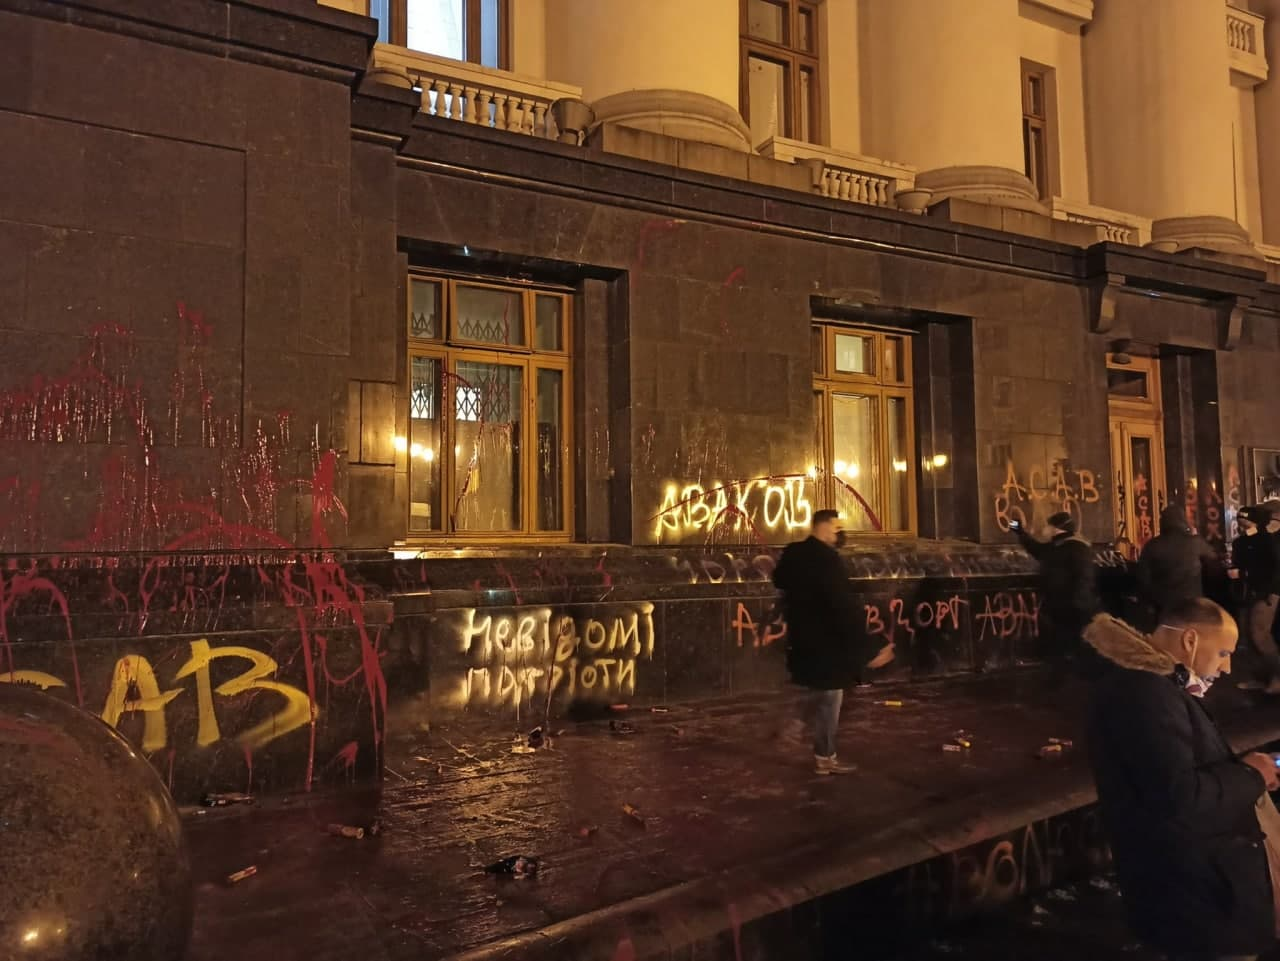 Офис президента залили краской и закидали петардами. ВИДЕО хаоса в Киеве 2